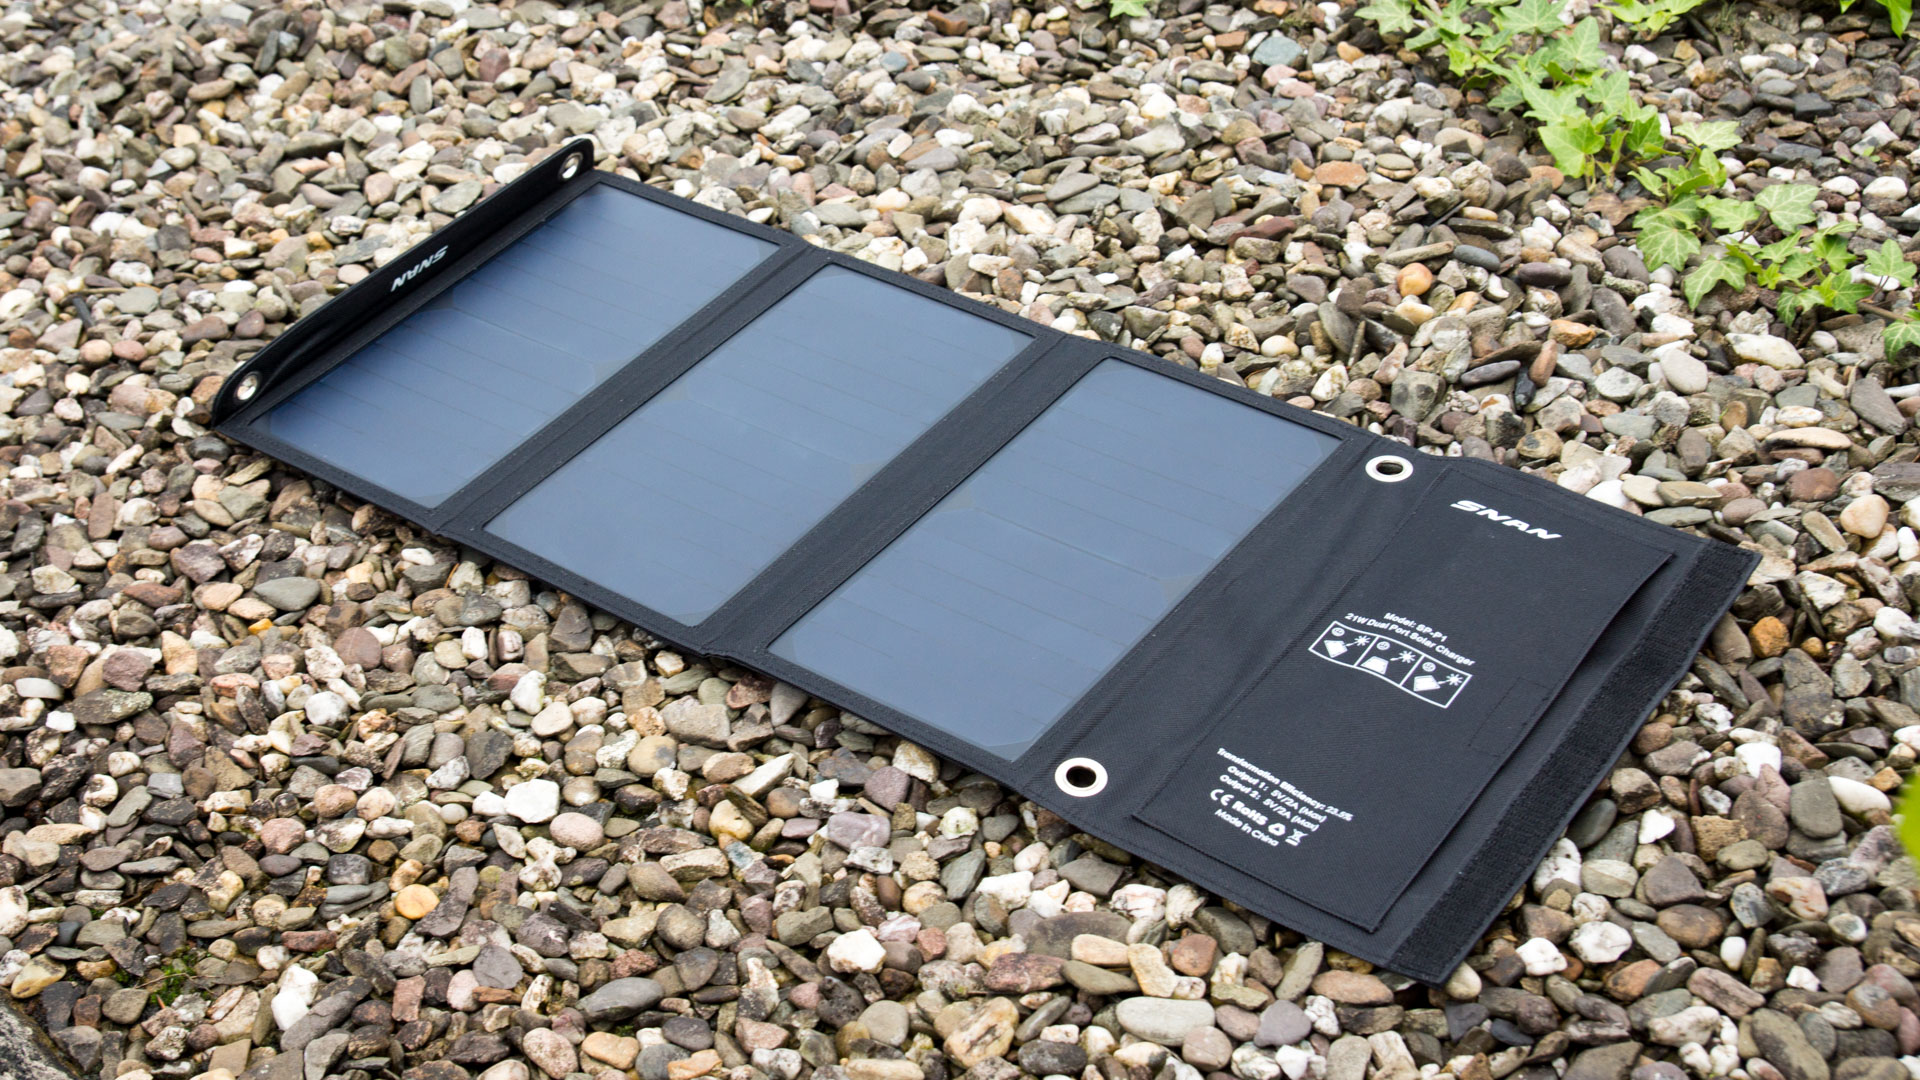 das snan 21w solar ladeger t im test techtest. Black Bedroom Furniture Sets. Home Design Ideas